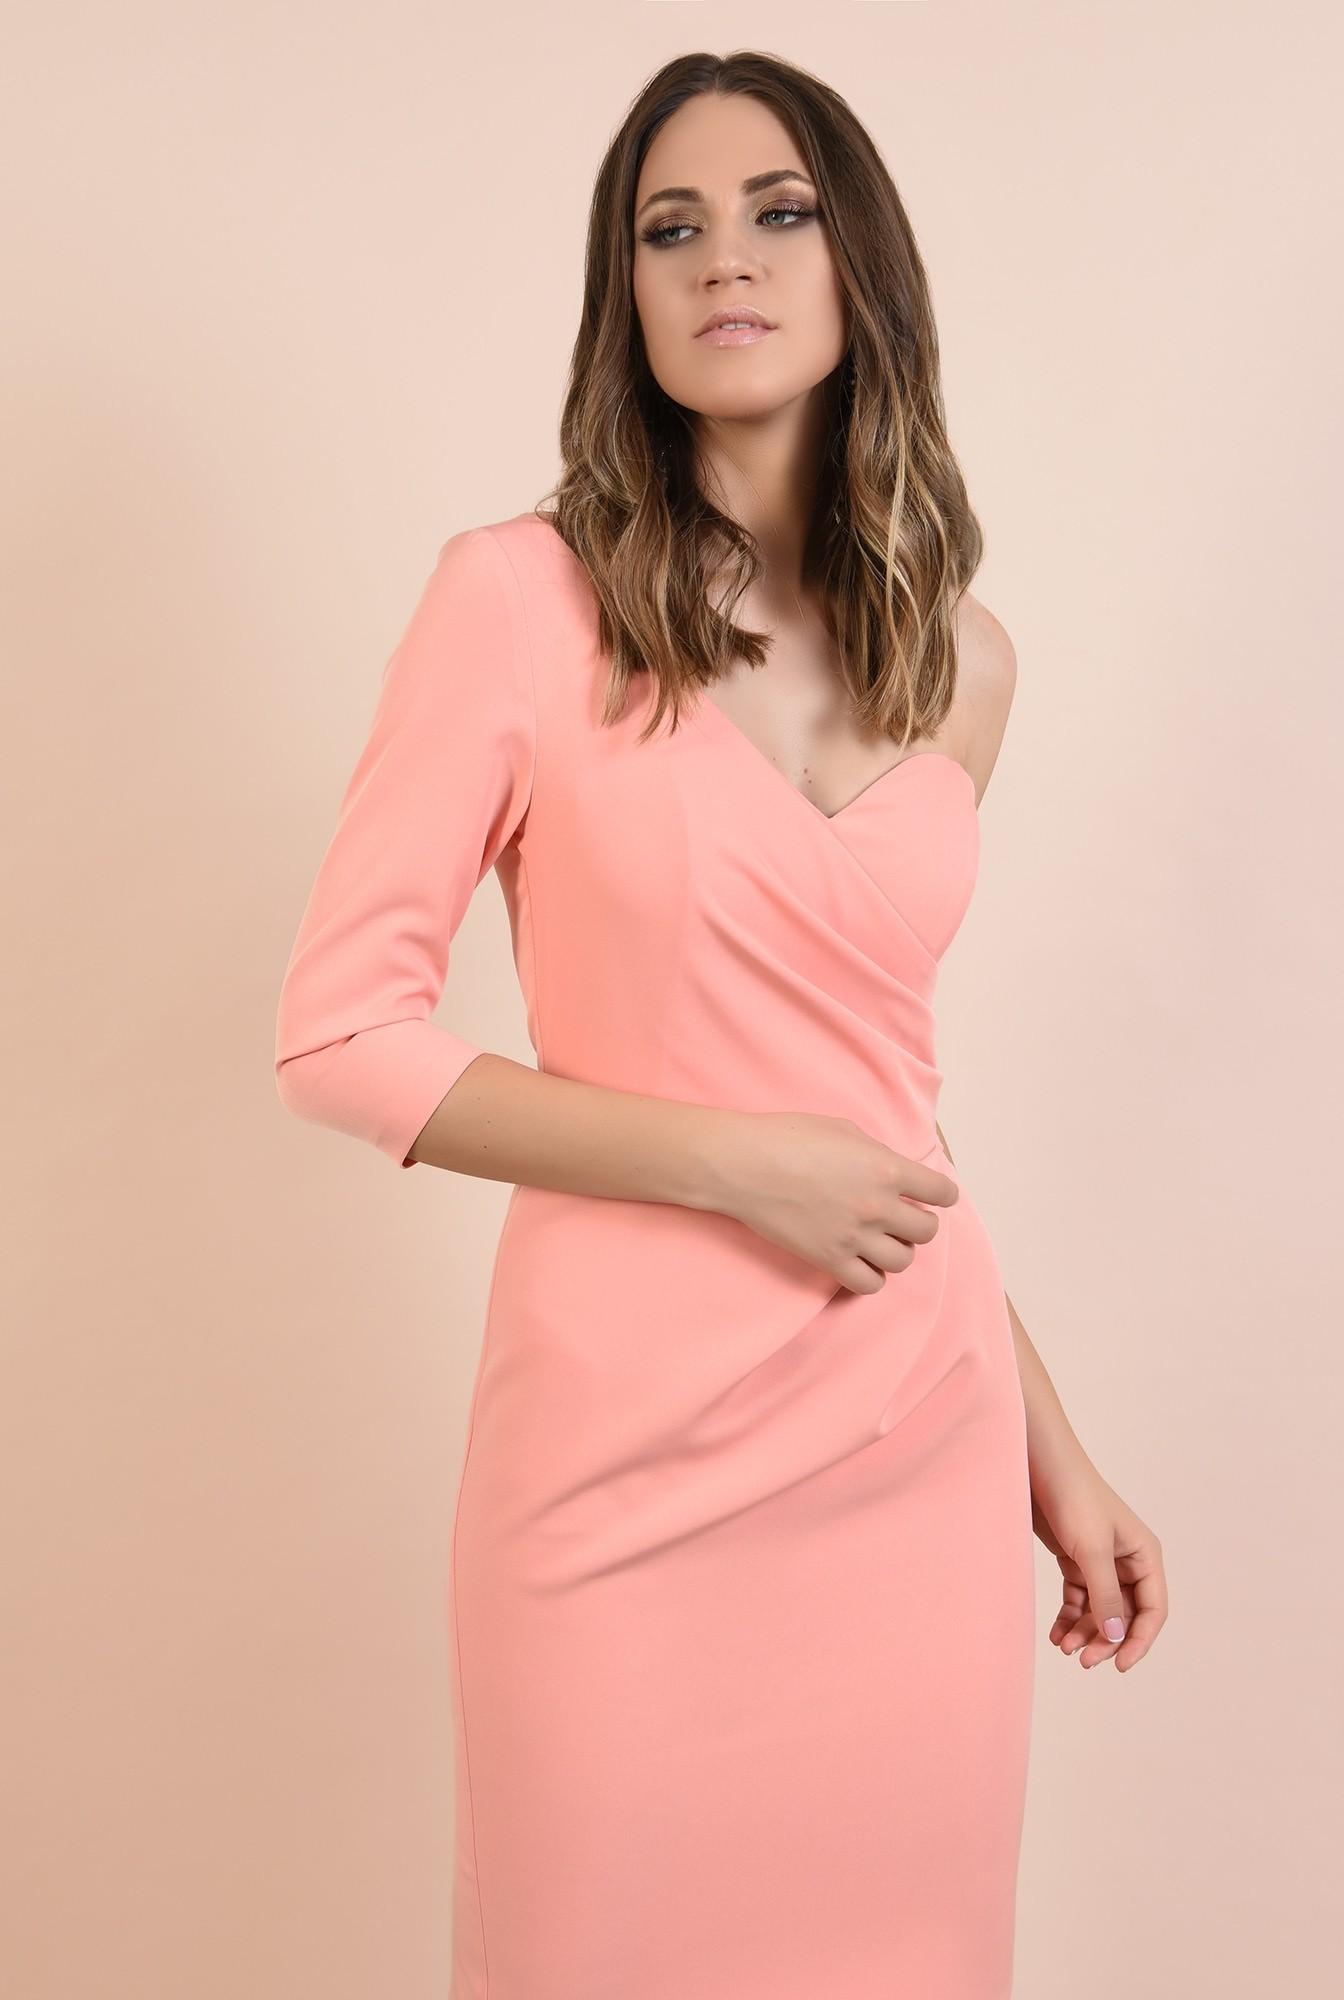 2 - rochie eleganta, decolteu inima, o maneca, croi conic, midi, Poema, roz somon